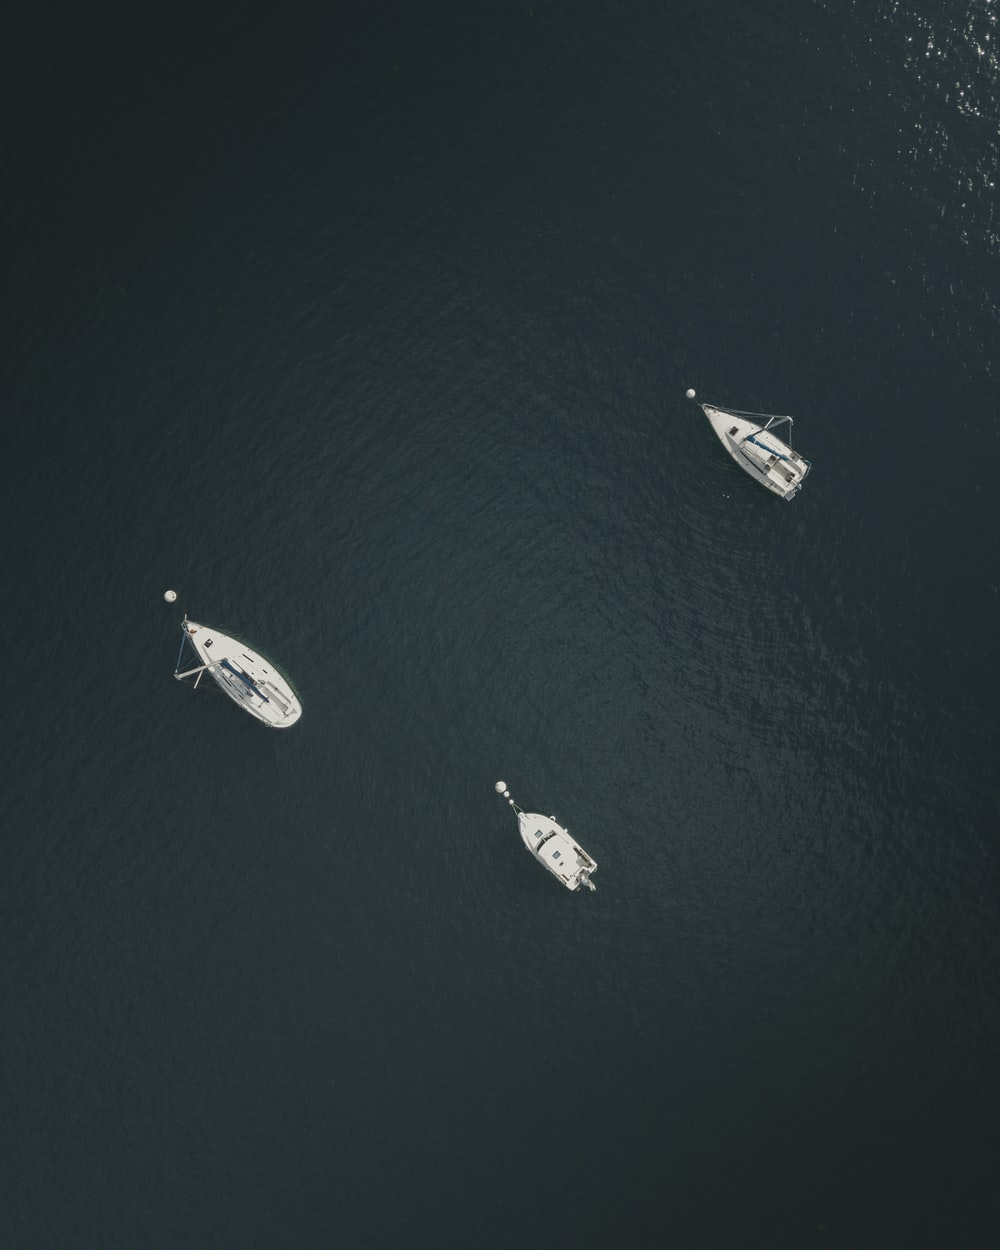 aerial view of three white sailboat